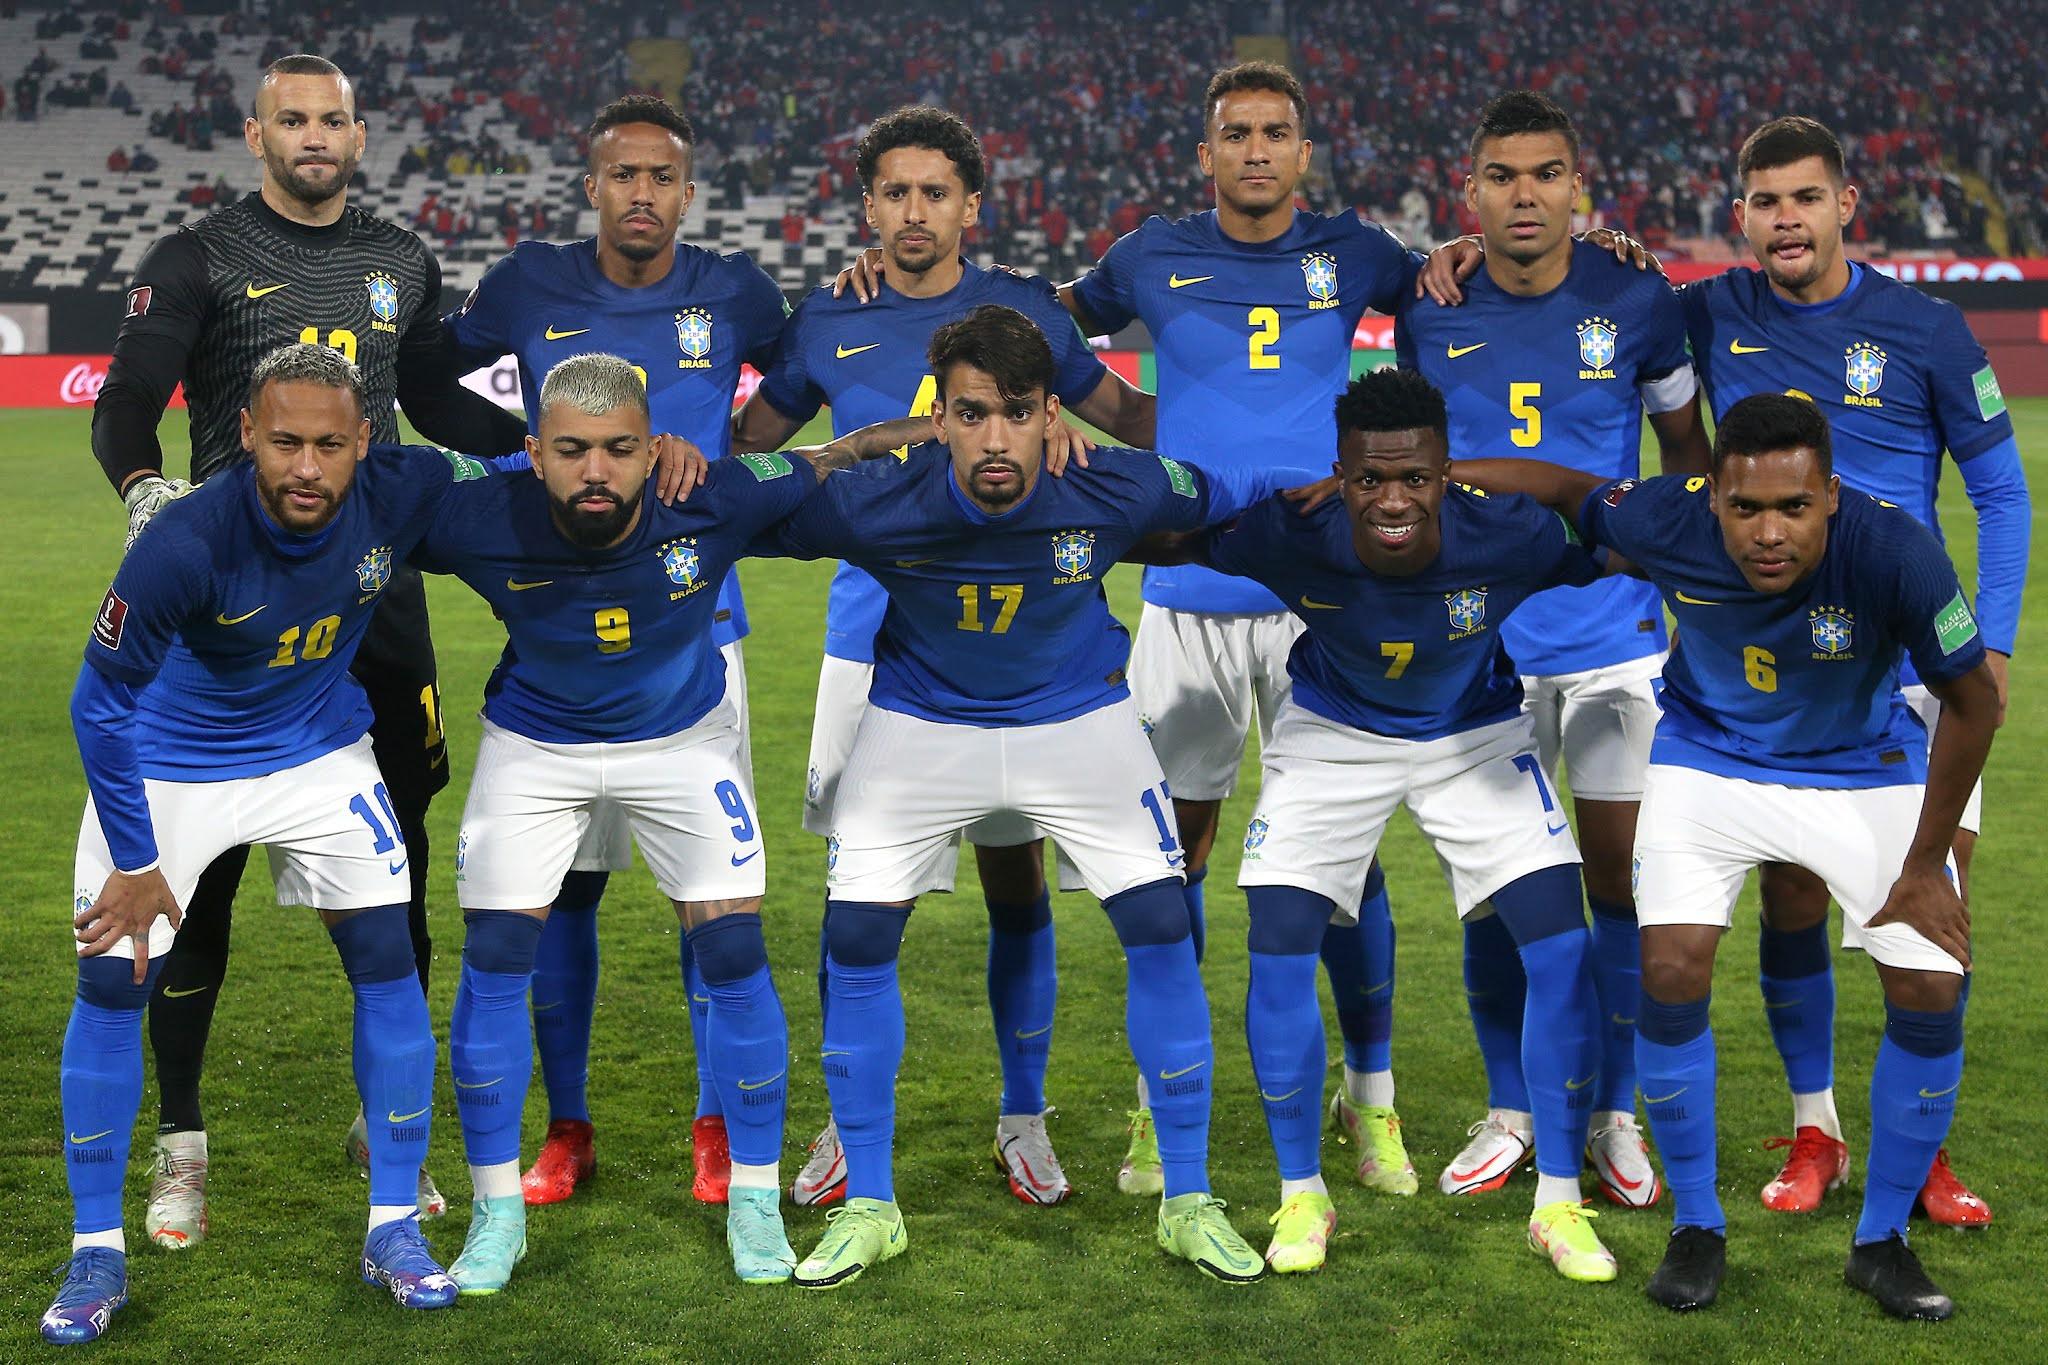 Formación de Brasil ante Chile, Clasificatorias Catar 2022, 2 de septiembre de 2021